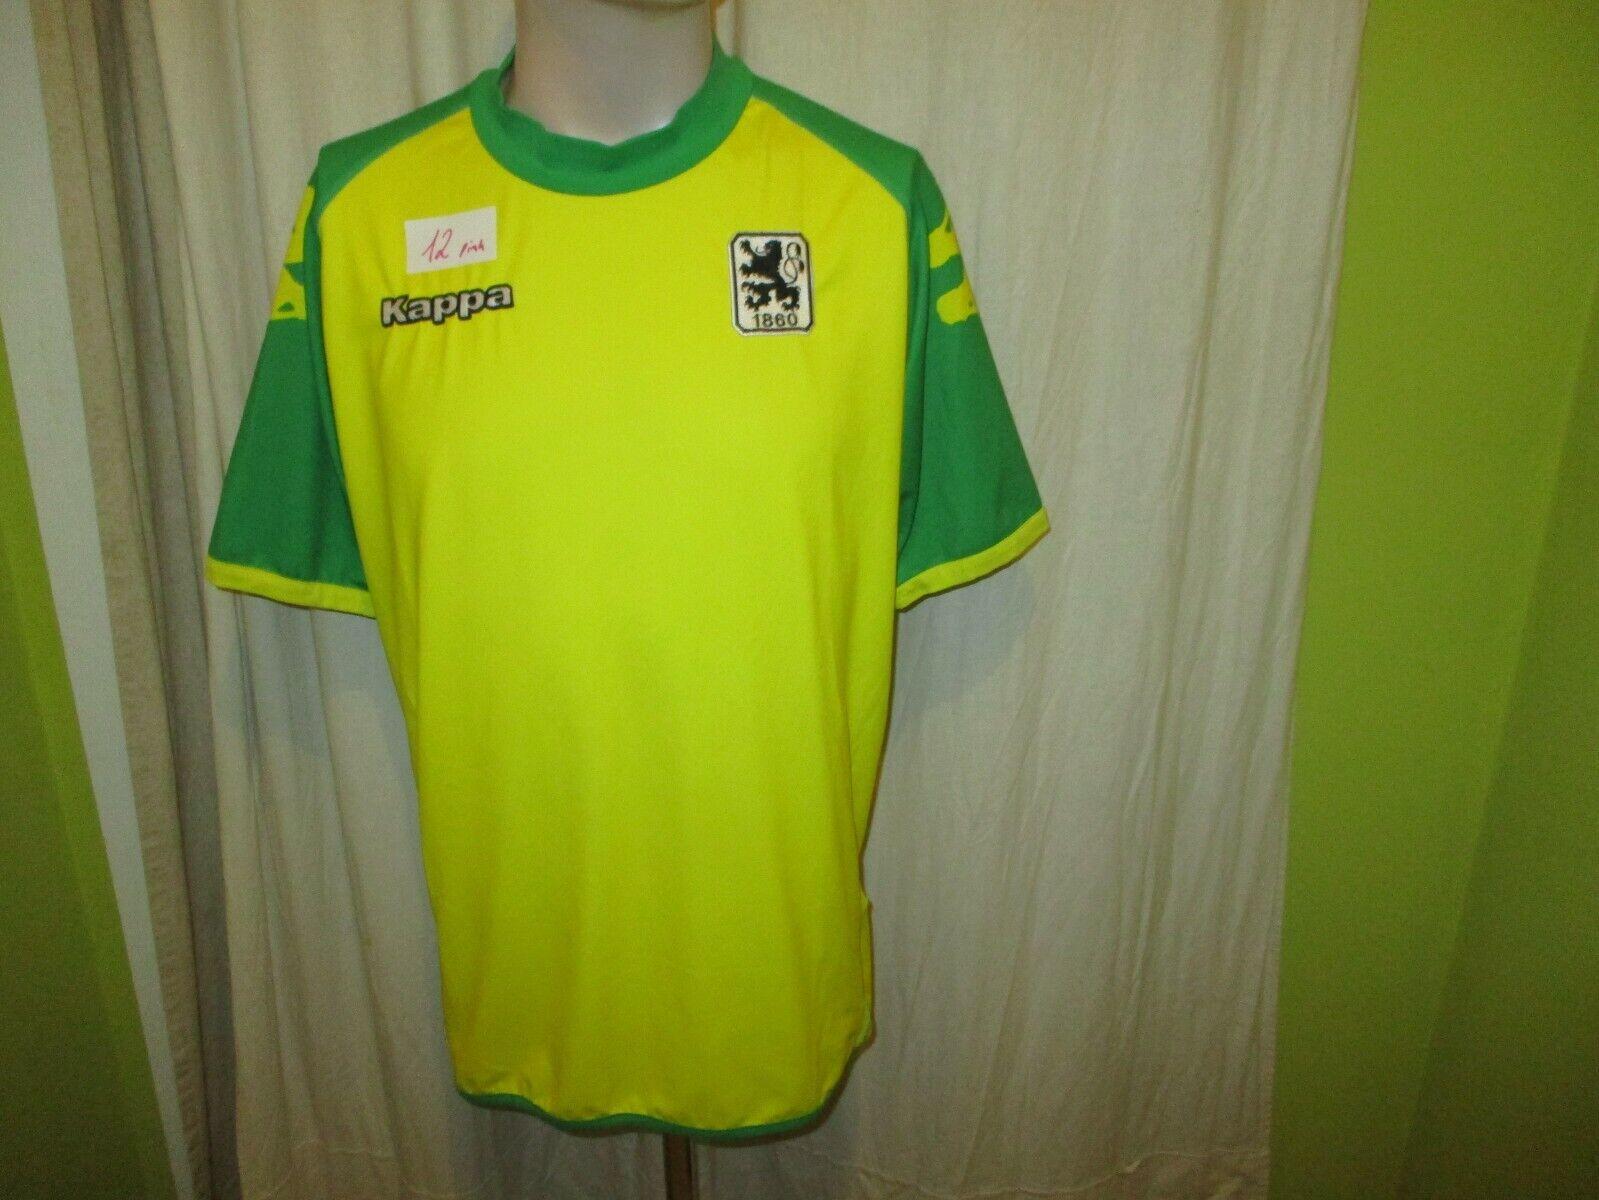 TSV 1860 München Kappa Ausweich Trikot 2006 07  ohne Hauptsponsor  Gr.XL-XXL TOP  | Gutes Design